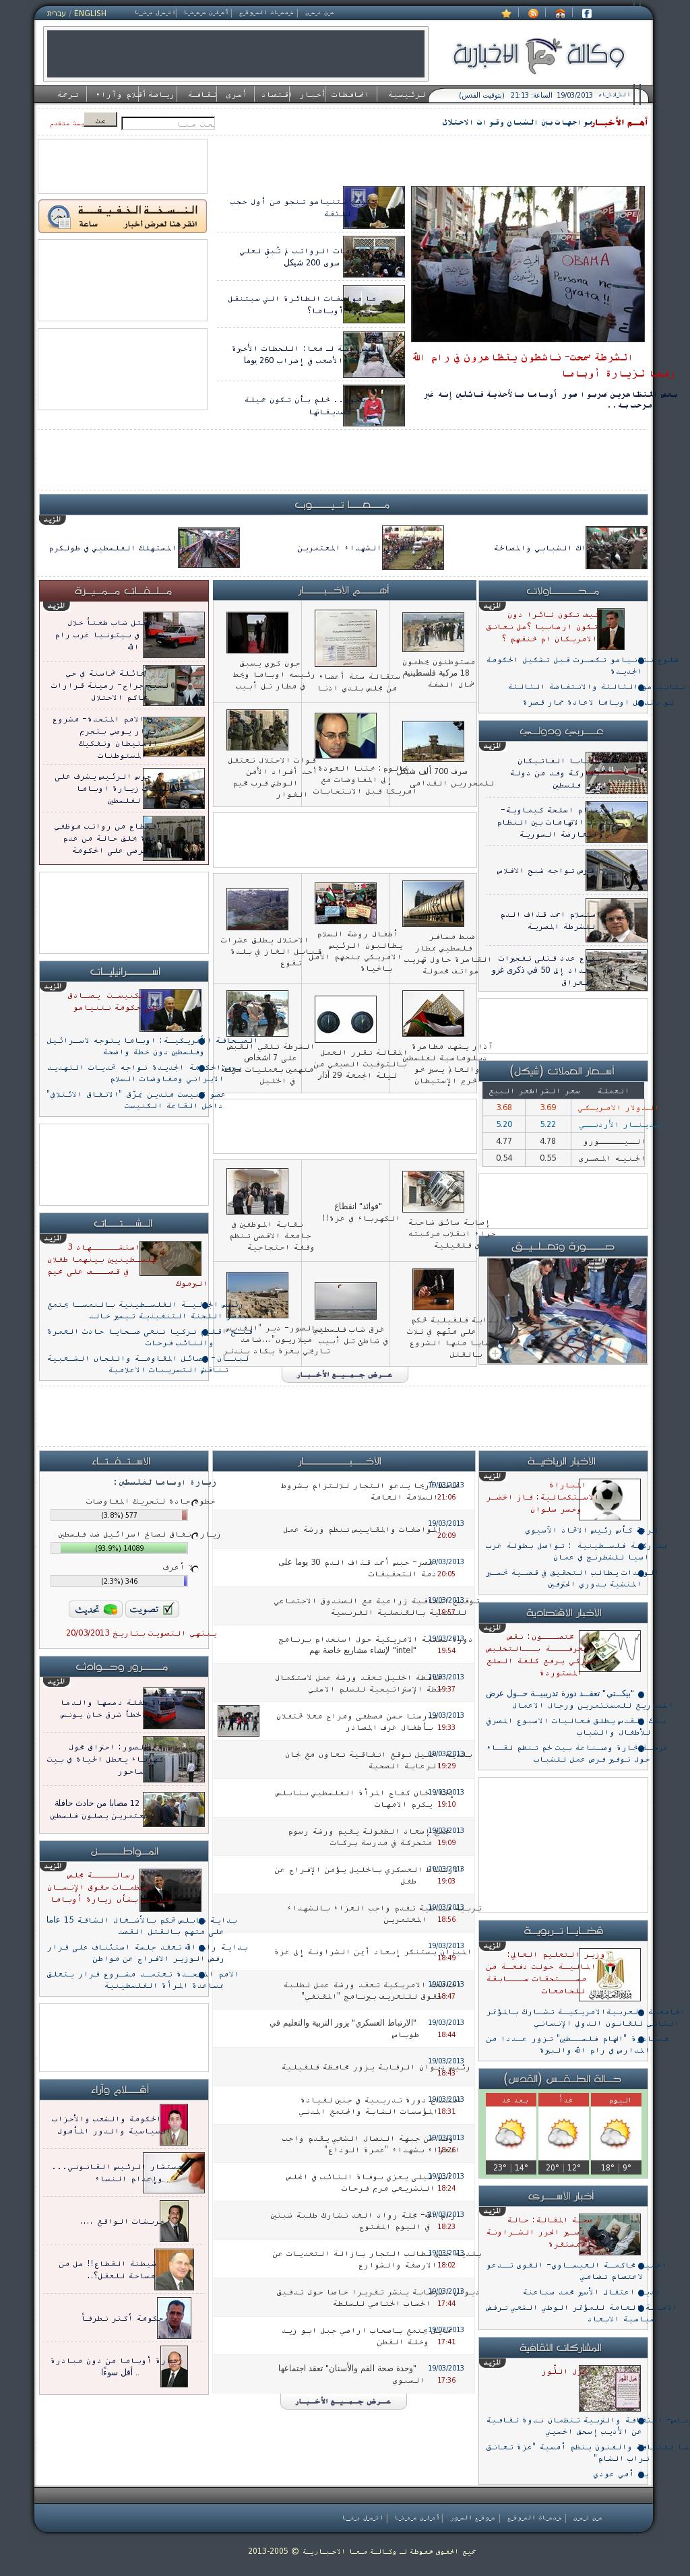 Ma'an News at Tuesday March 19, 2013, 7:13 p.m. UTC